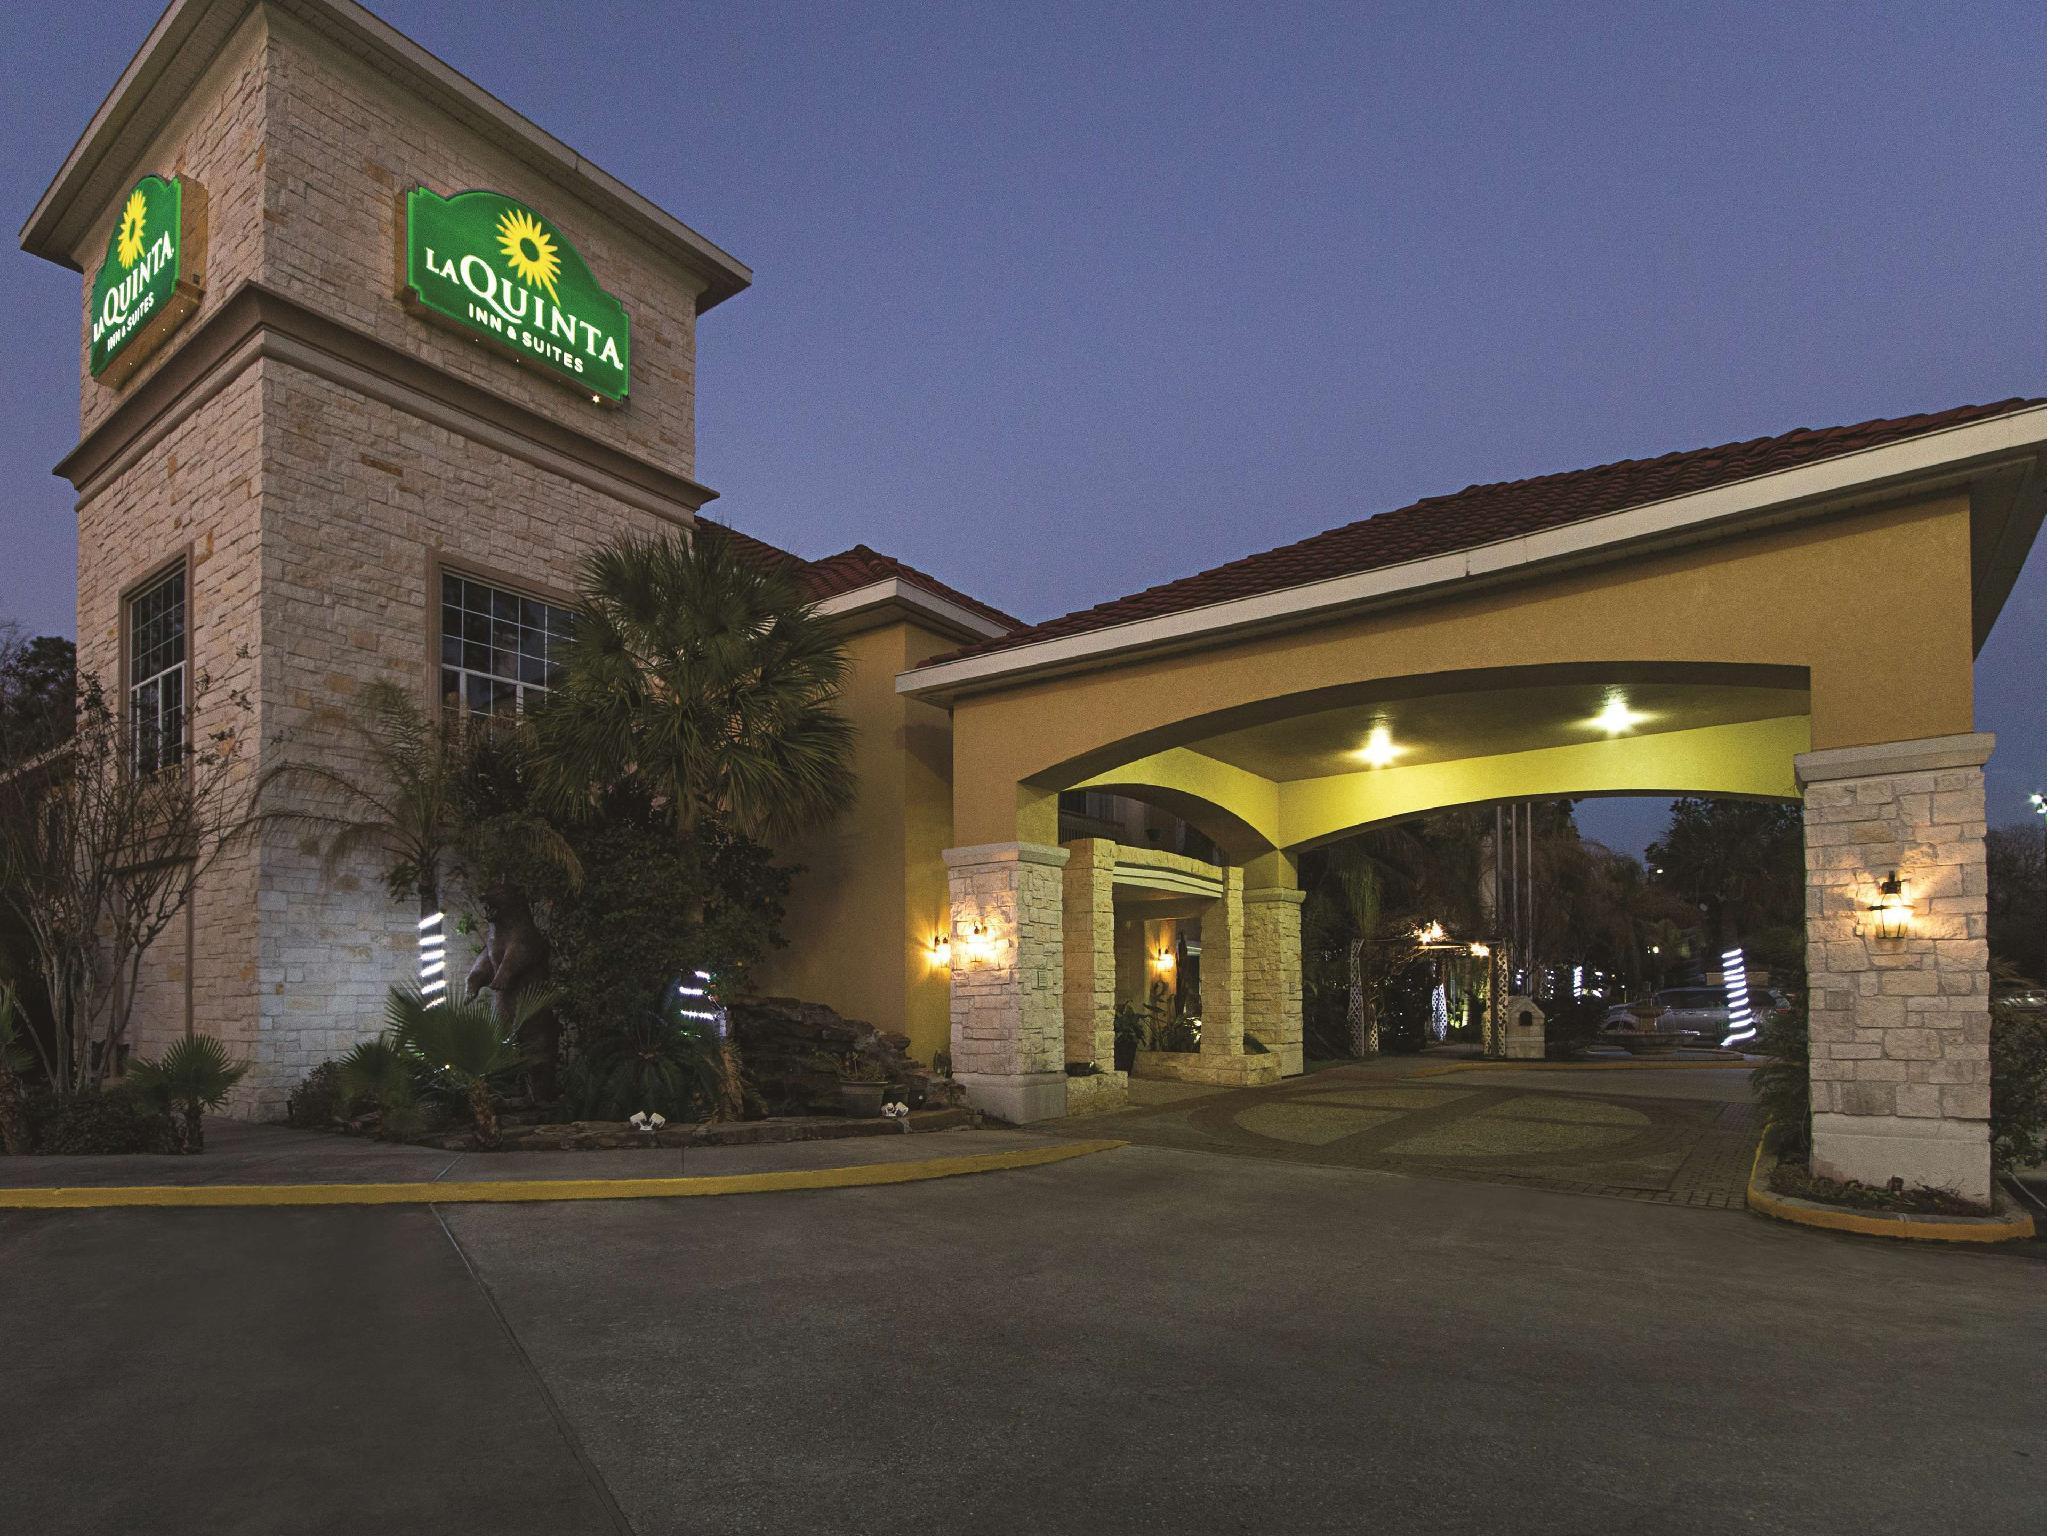 La Quinta Inn And Suites By Wyndham Houston Kingwood Medical